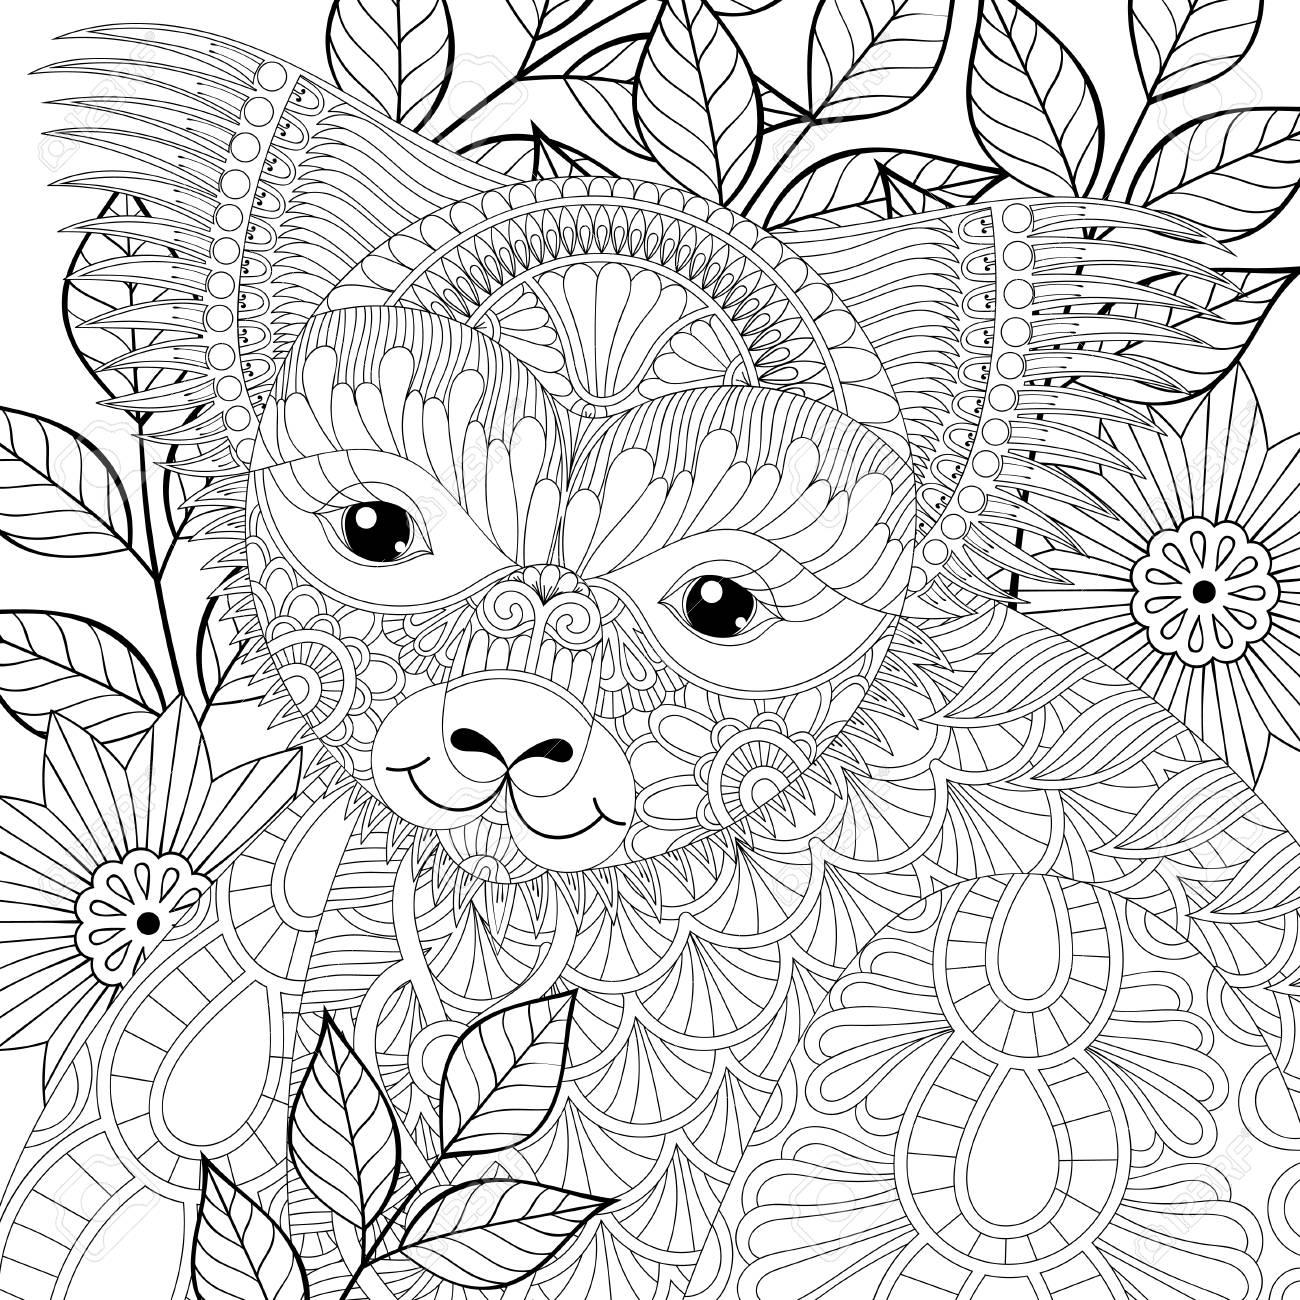 Vector Zentangle Happy Friendly Koala For Adult Anti Stress Coloring